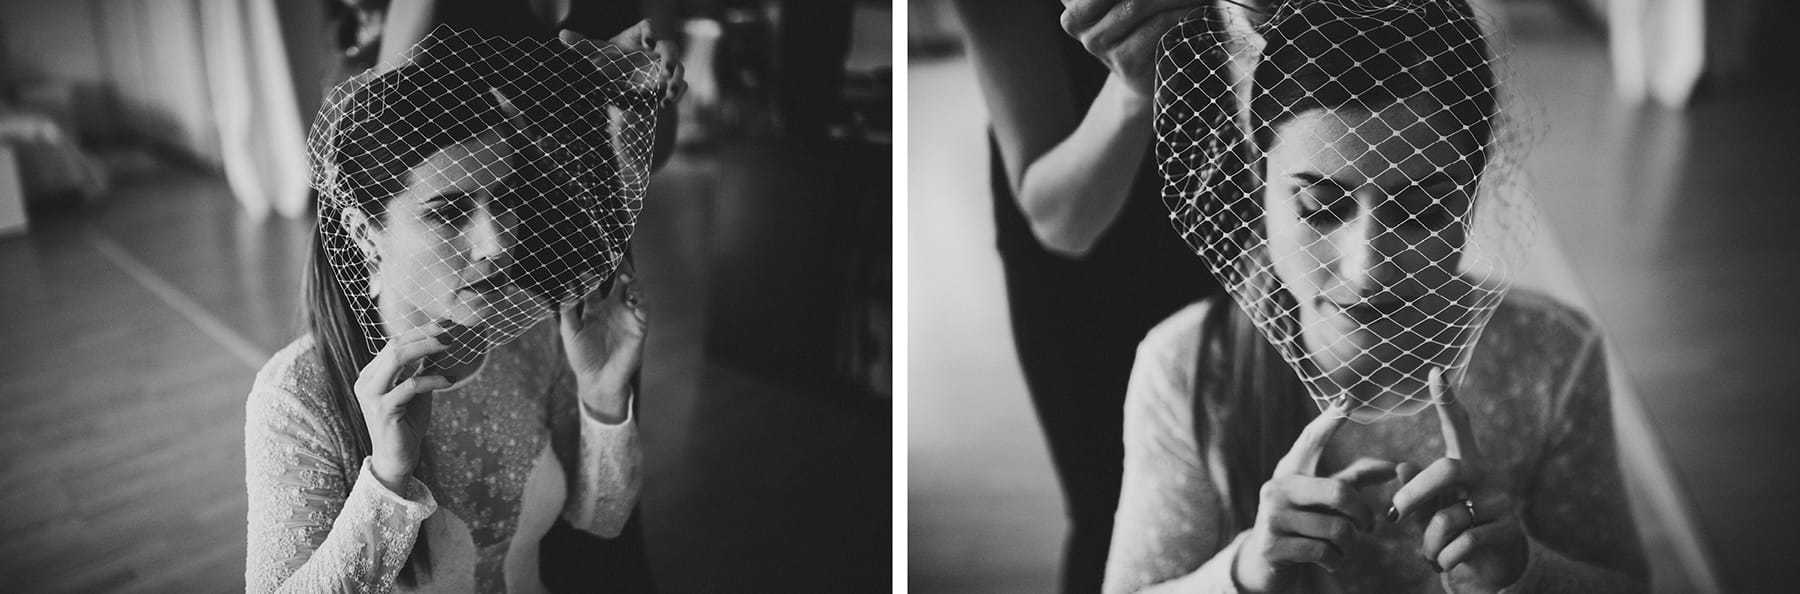 vestido_de_novia_otaduy_hilario_sanchez_fotografo_boda_barcelona_034